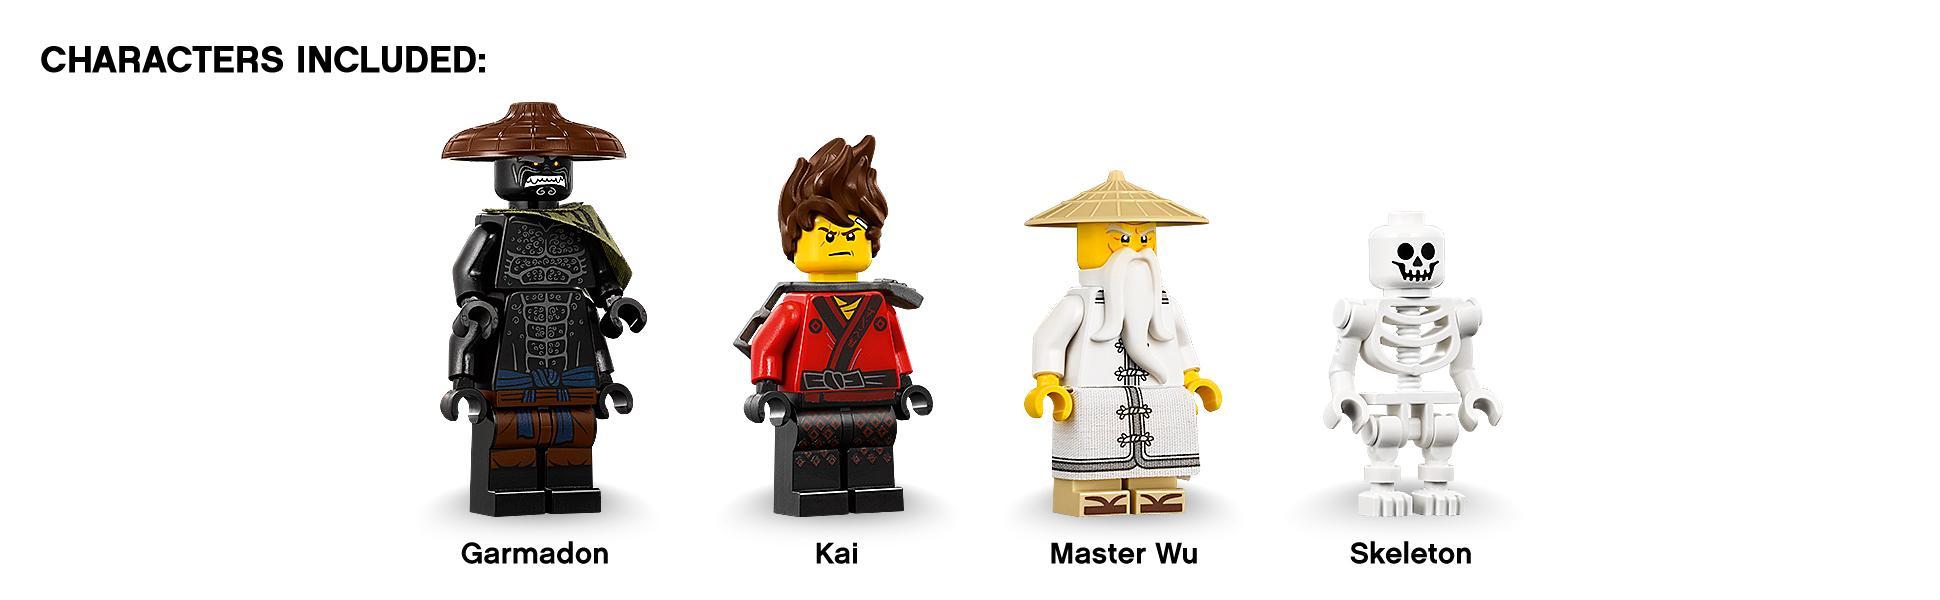 how to build lego dimensions ninjago llyod vehicle